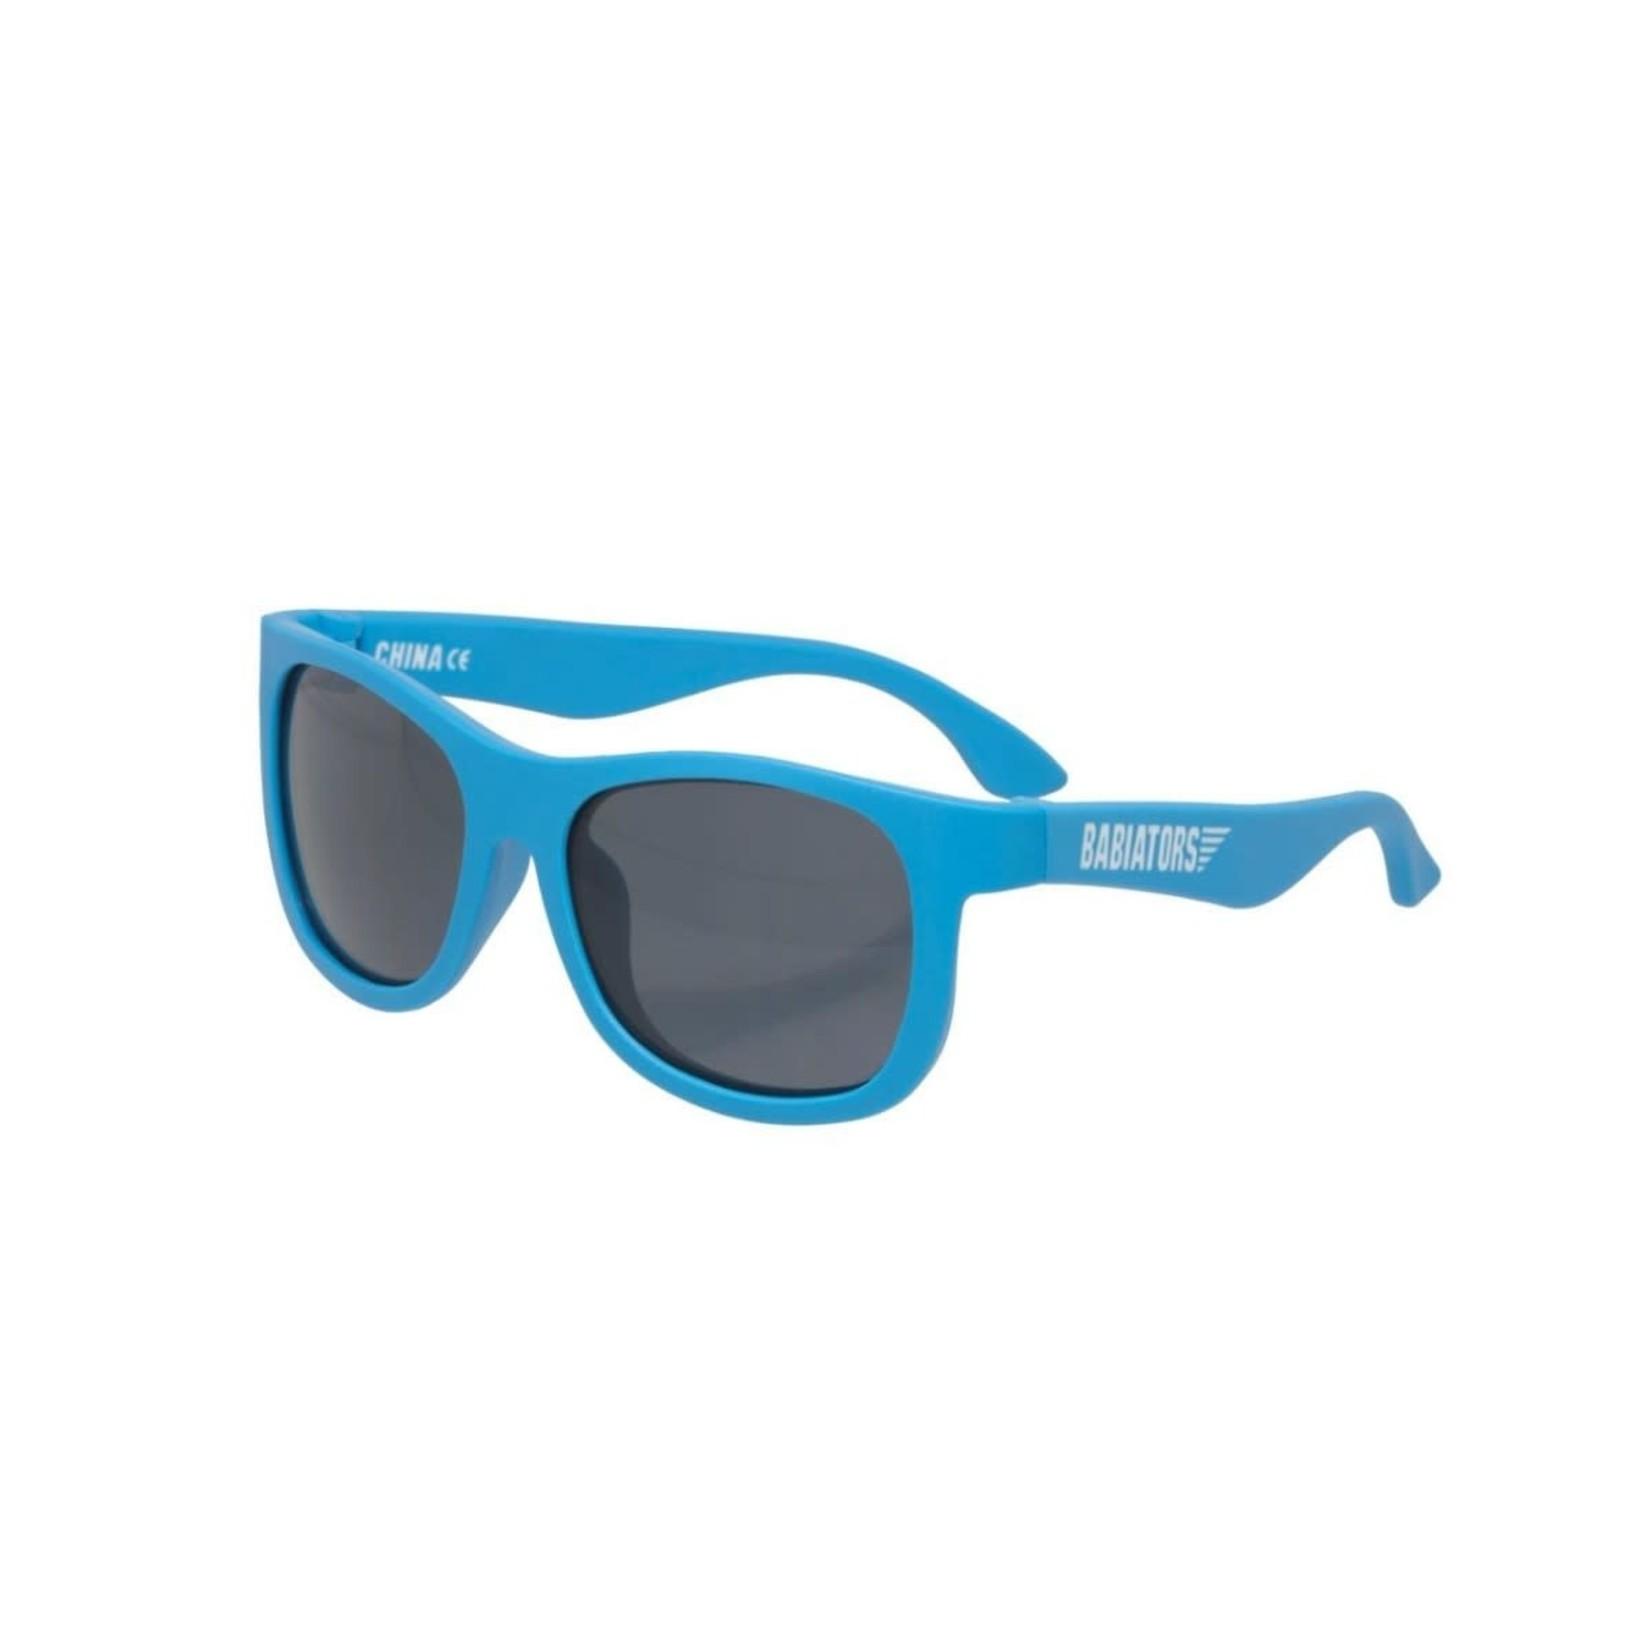 Babiators Sunglasses - Navigator Blue Crush (Age 0-2)